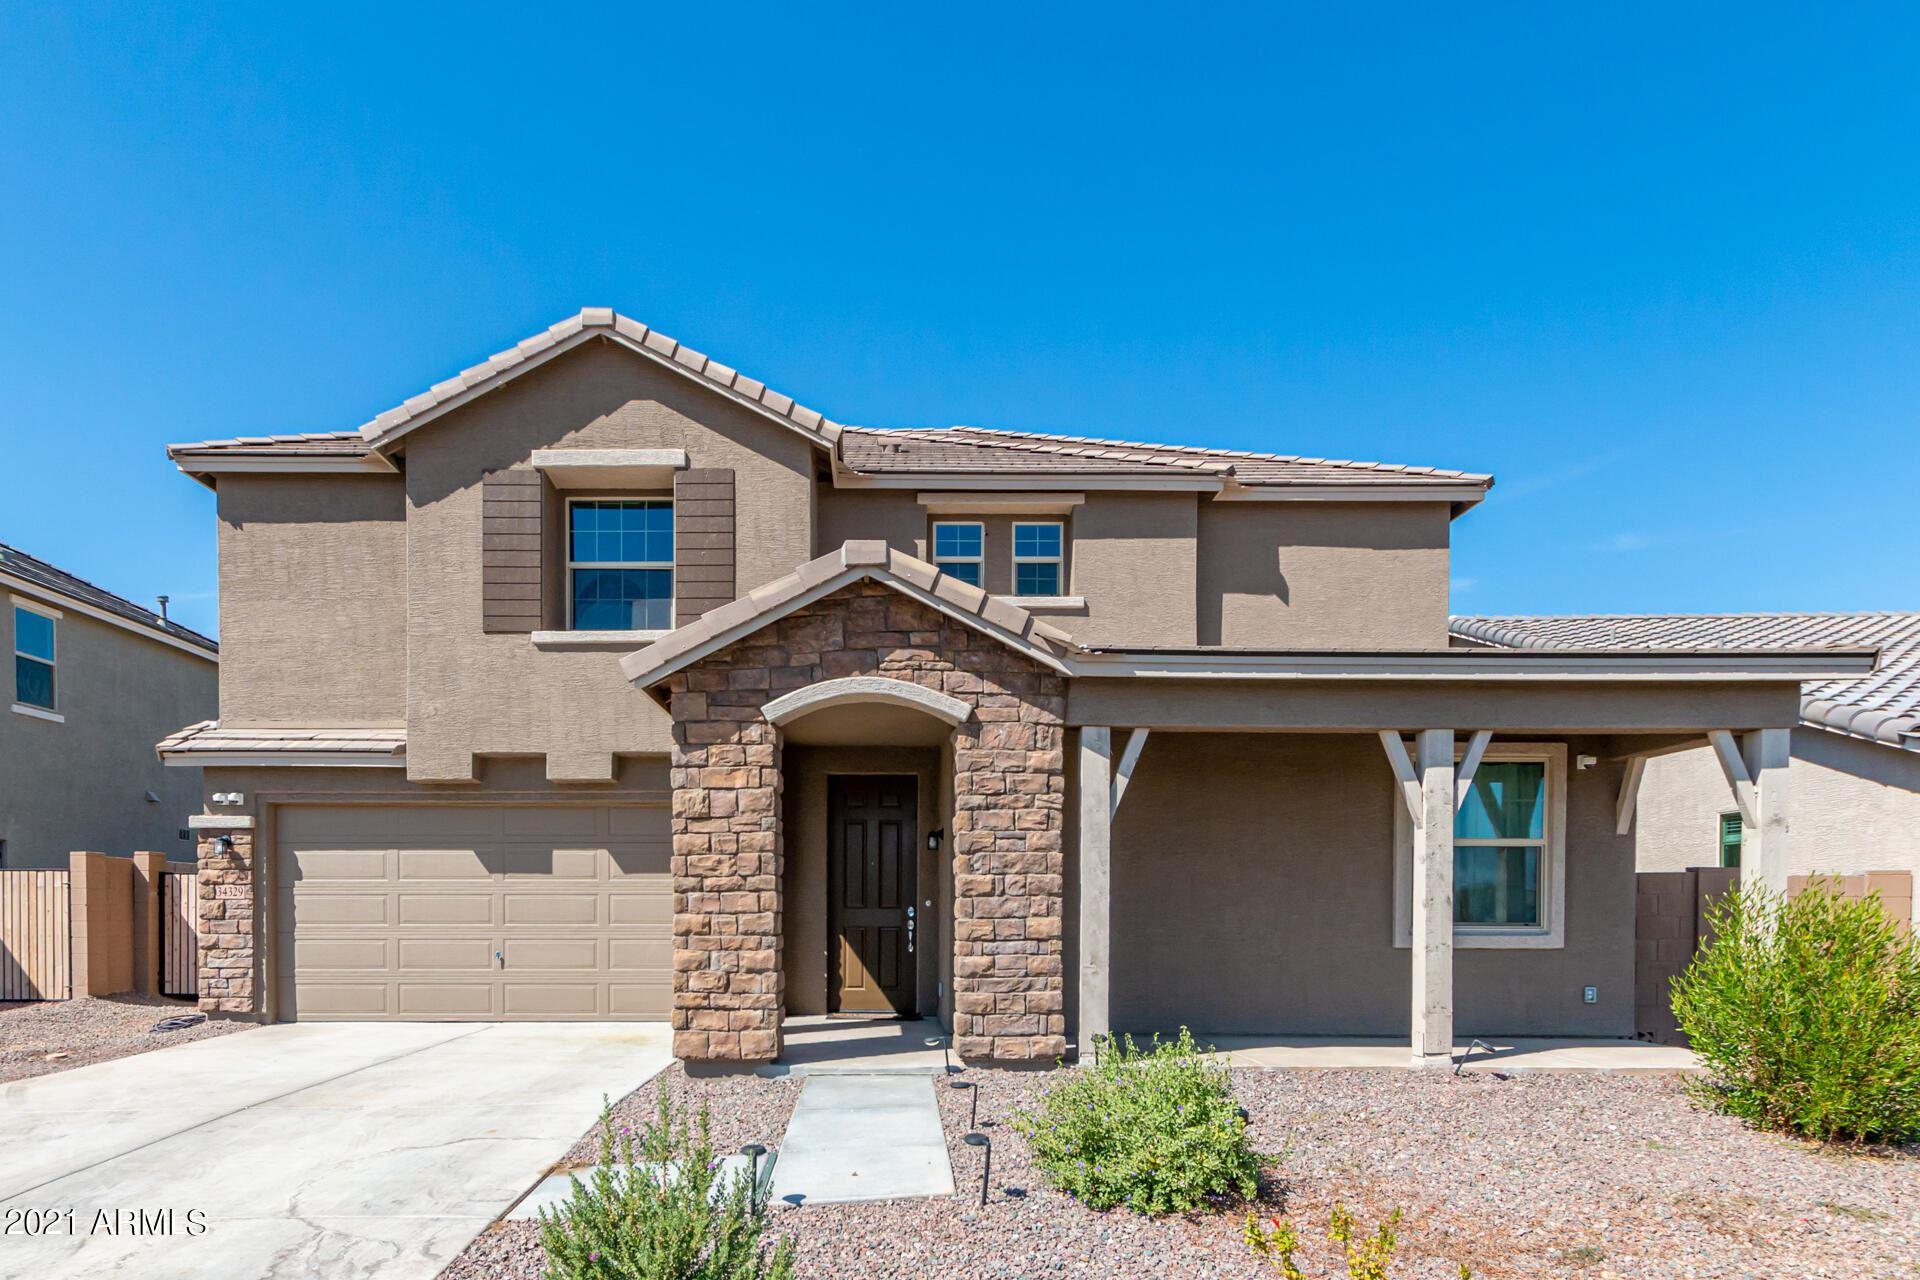 34329 N Casey Lane, Queen Creek, AZ 85142 - #: 6302361